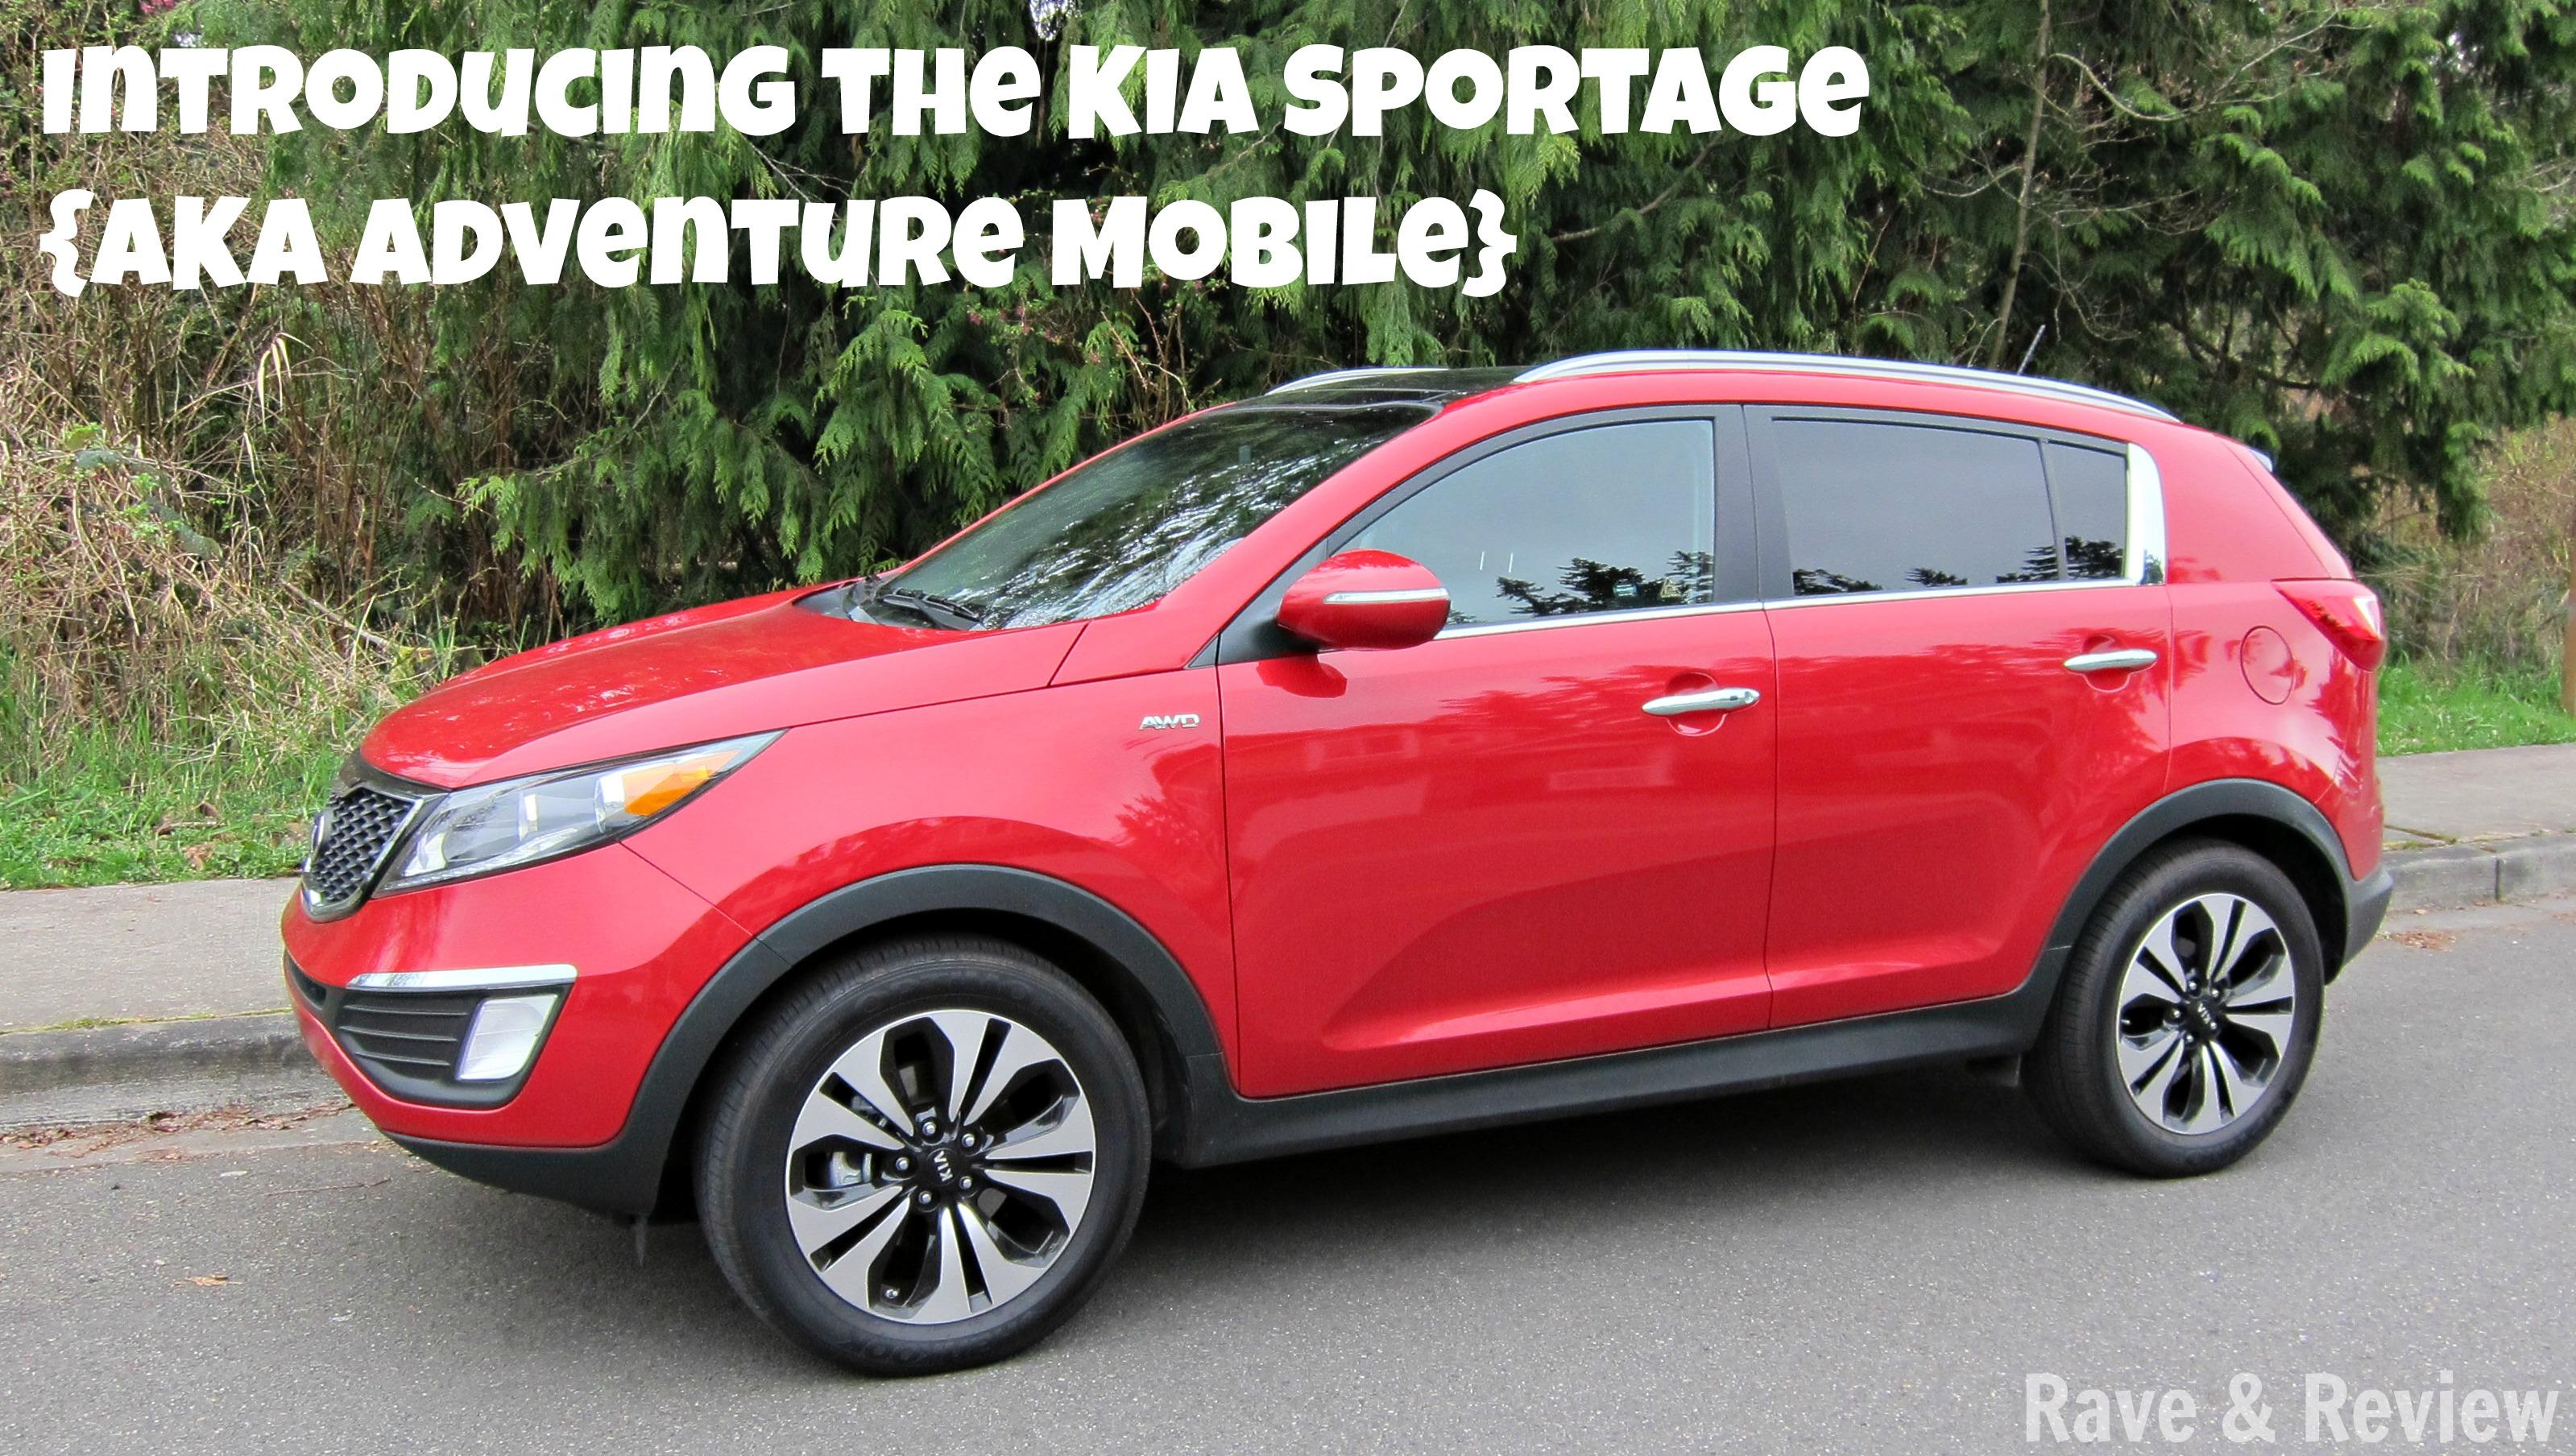 Color me curious the secrets behind the kia sportage colors - Kia Adventure Mobile